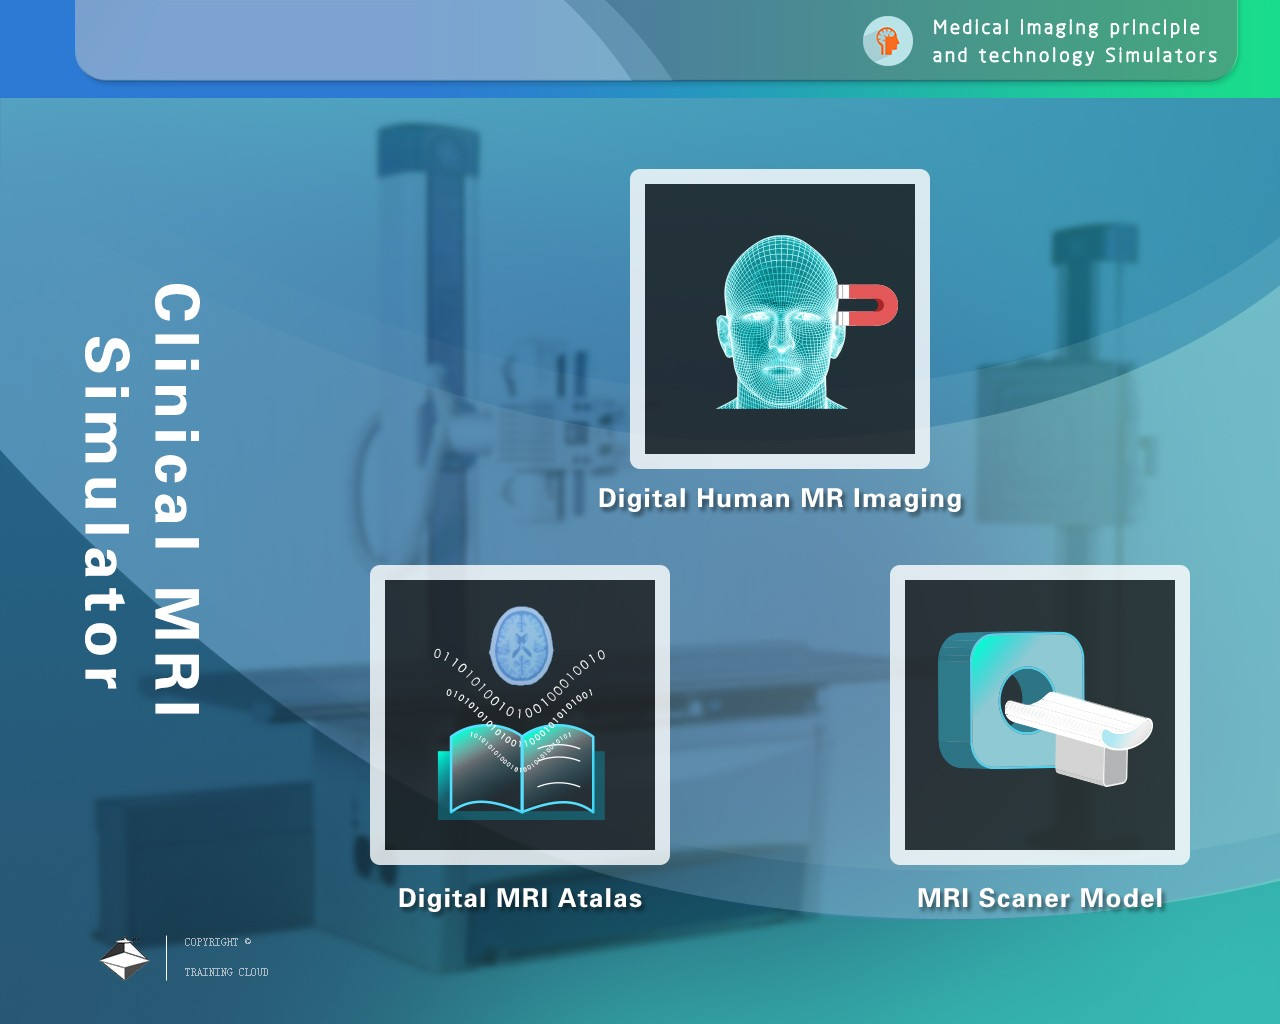 DMRAtlasV1.0临床核磁共振仿真实验仪